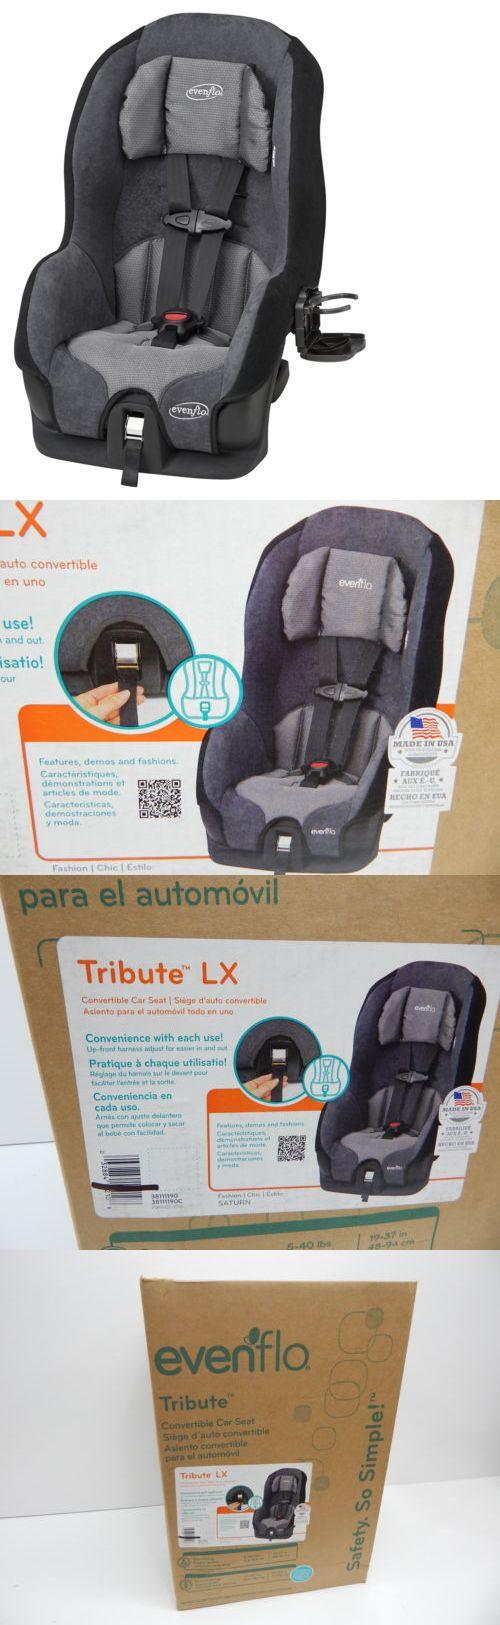 Evenflo 38111190 Tribute LX Convertible Baby Car Seat Saturn BOX DAMAGAE